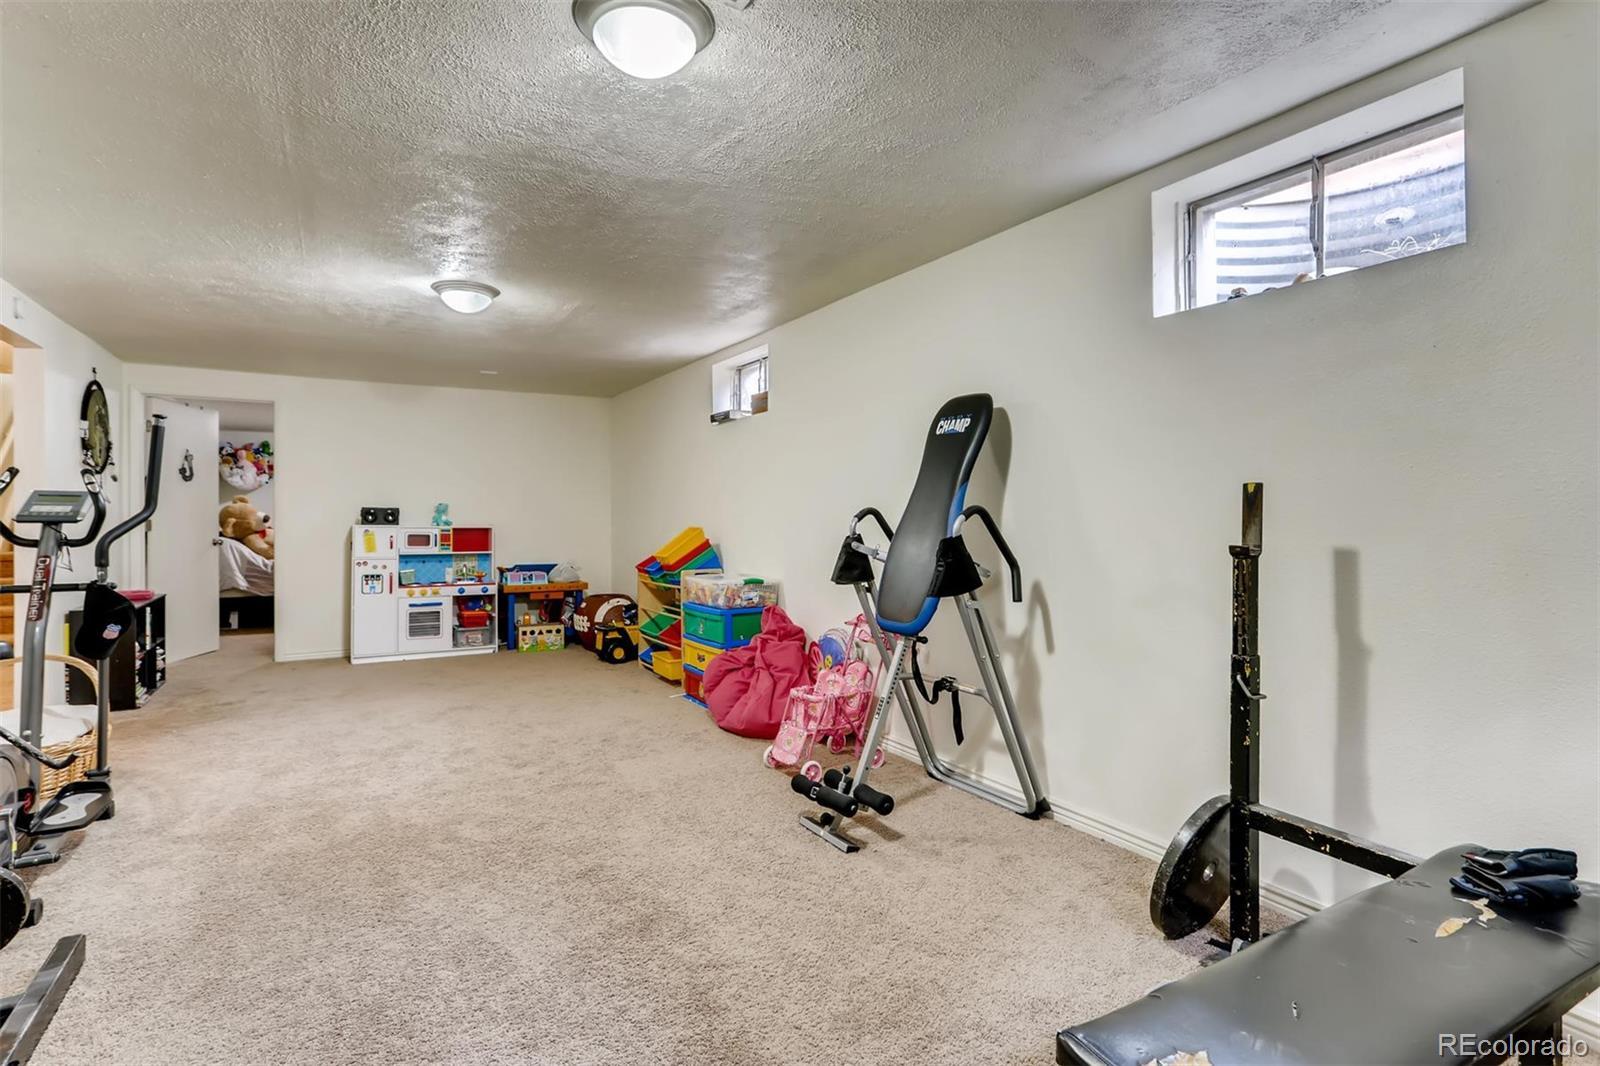 MLS# 7901545 - 13 - 1389 Douglas Drive, Denver, CO 80221